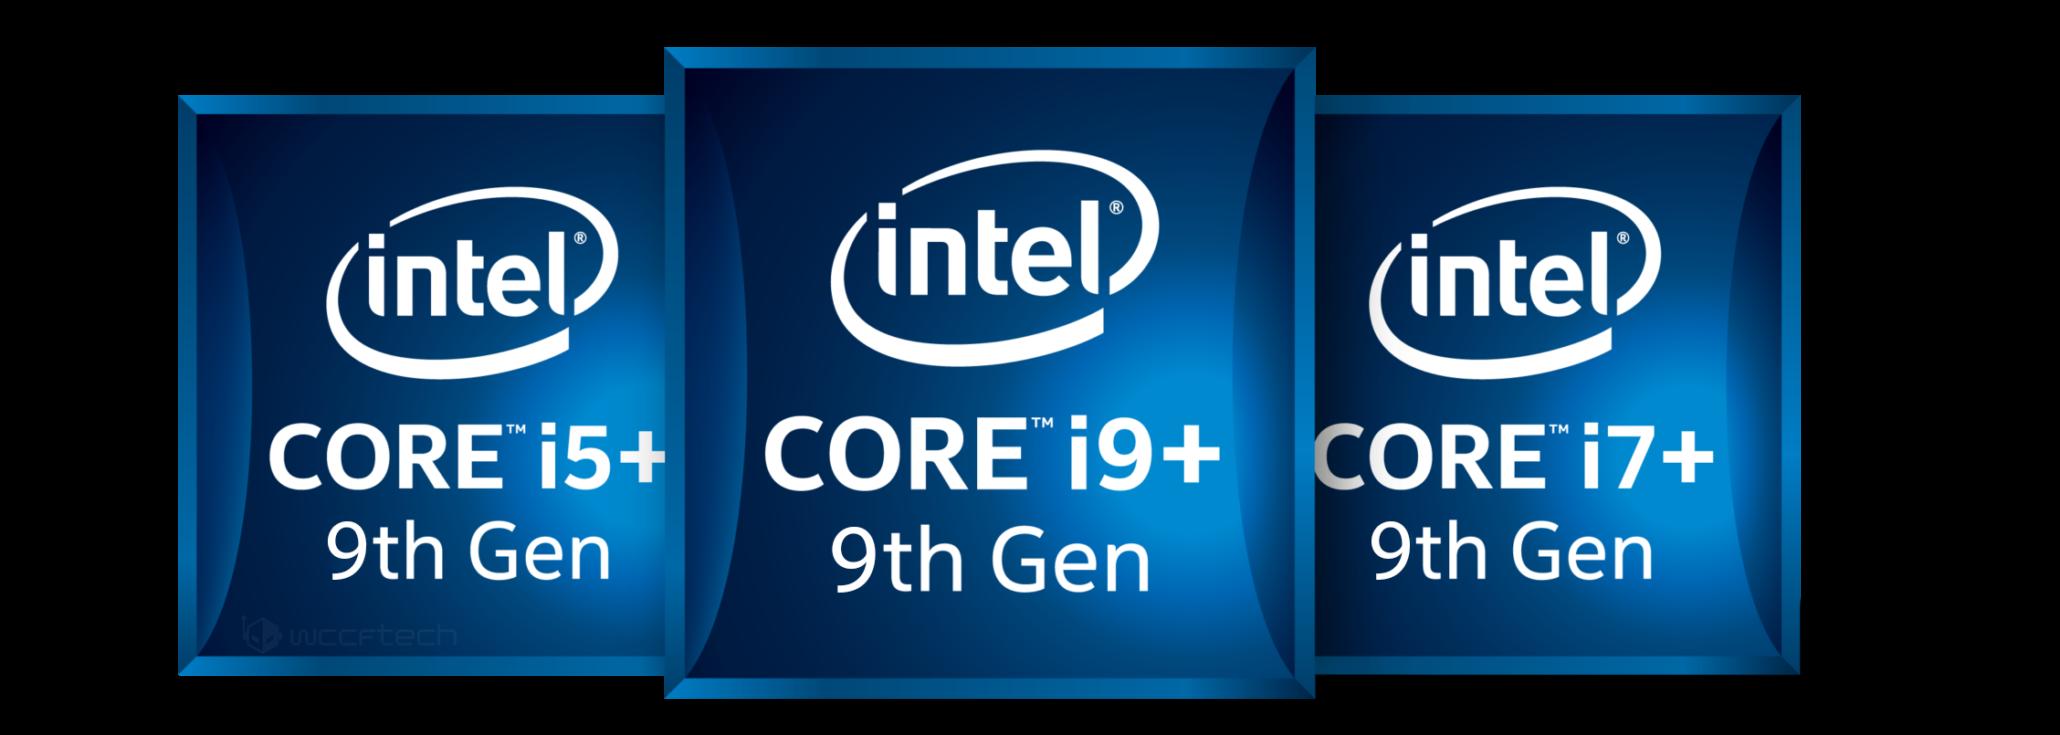 Intel Core i9 Gaming PCs